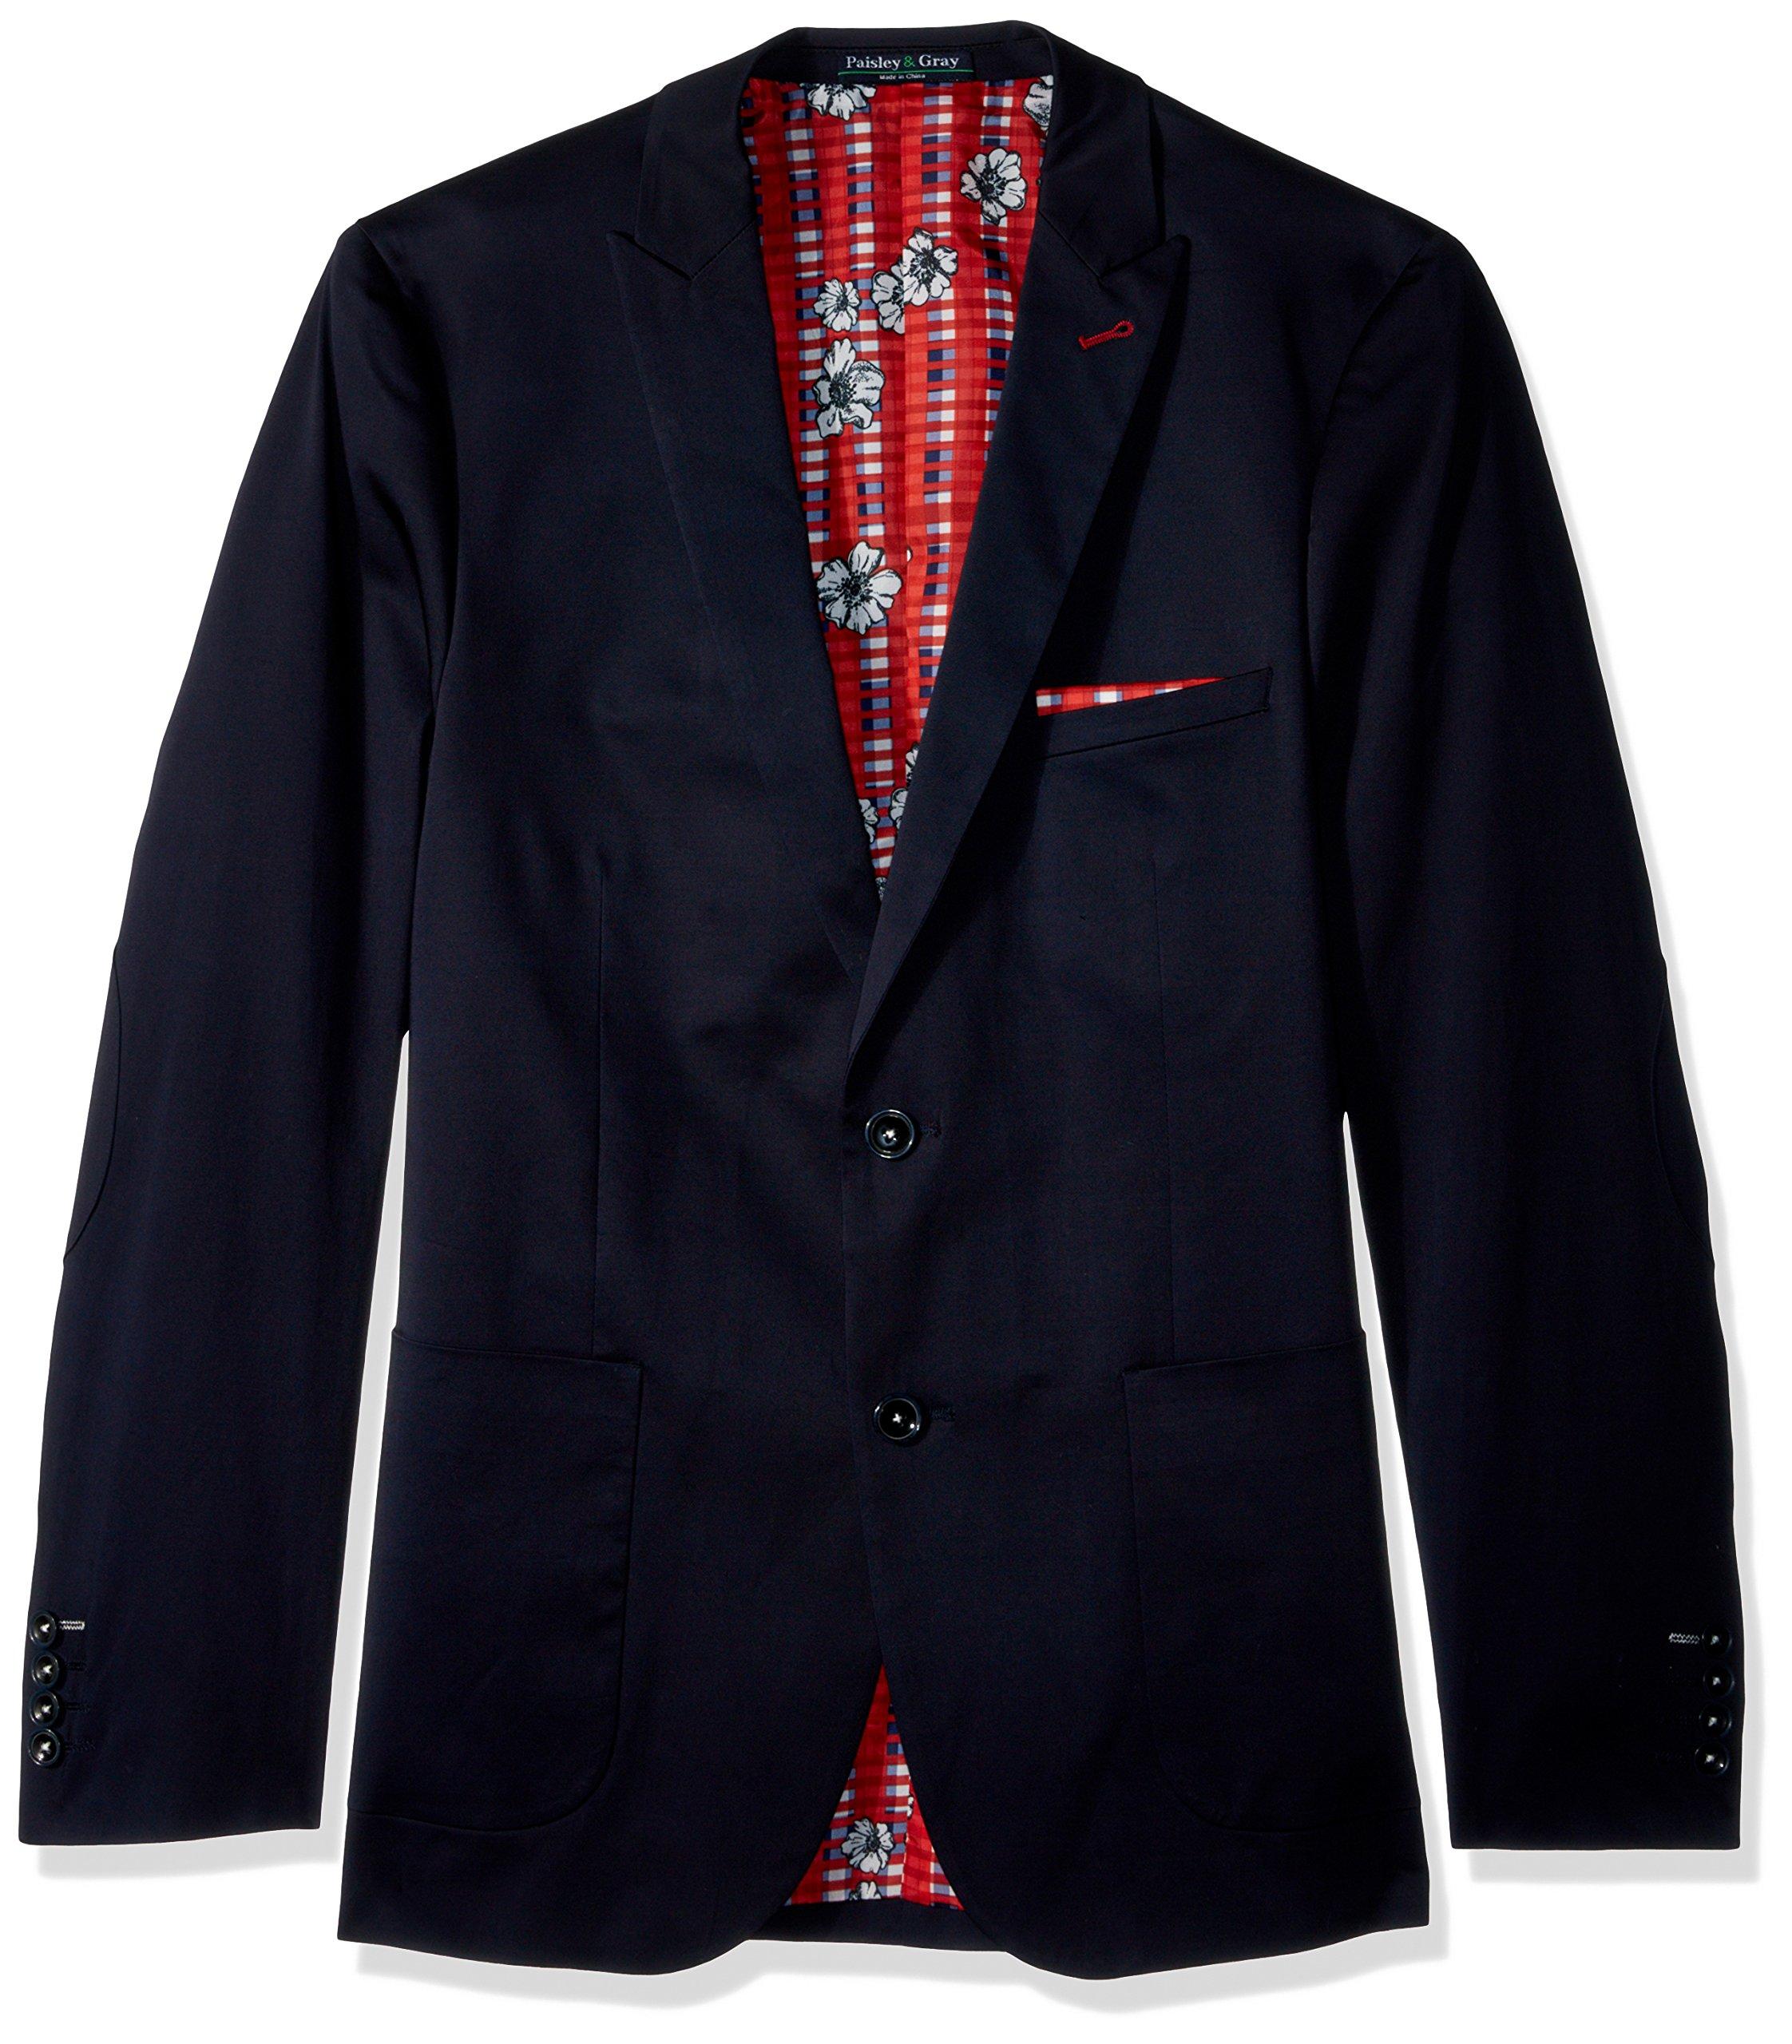 Paisley & Gray Men's Ashton Slim Fit Sportcoat, Navy, 36R